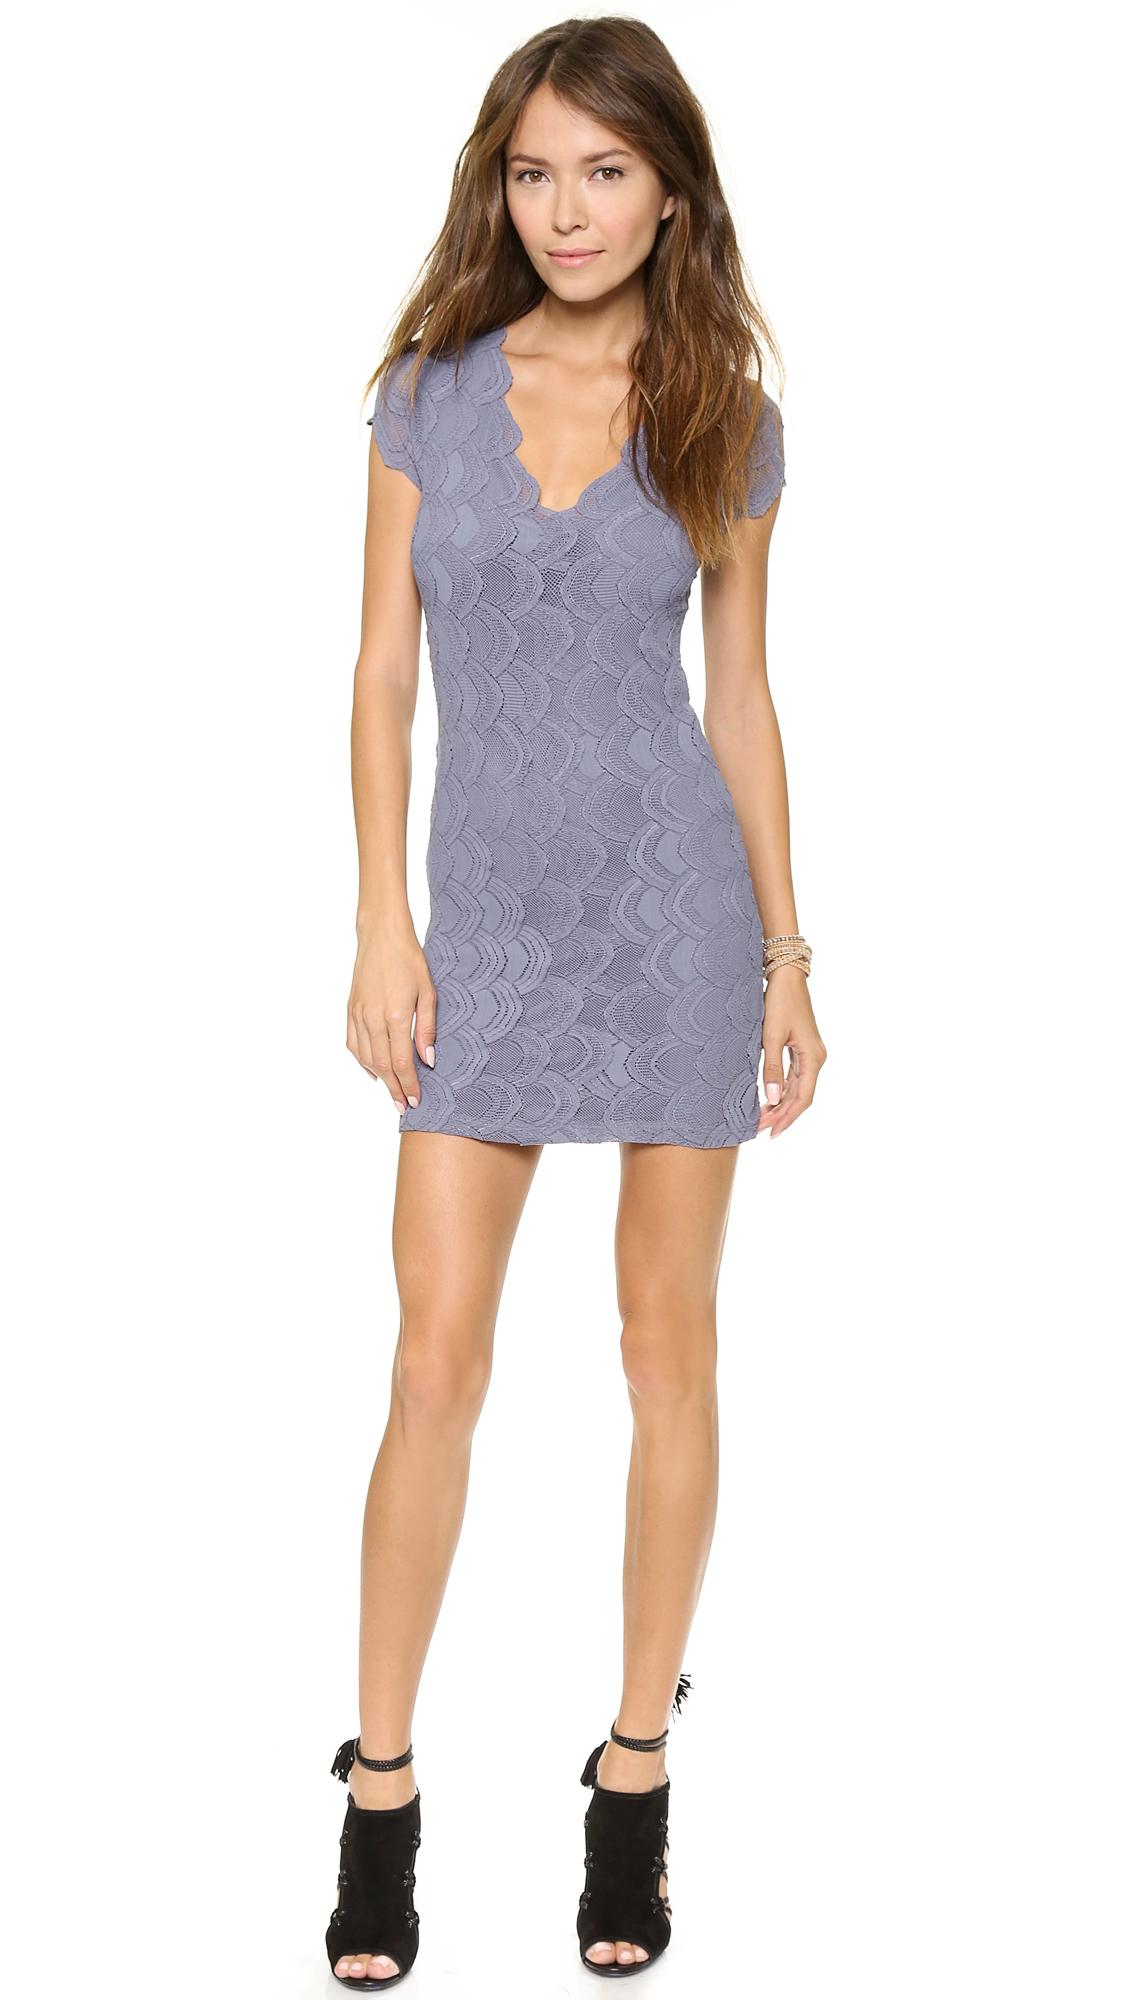 dfa0b8b2a8 Lyst - Nightcap Deep V Cap Sleeve Dress in Blue